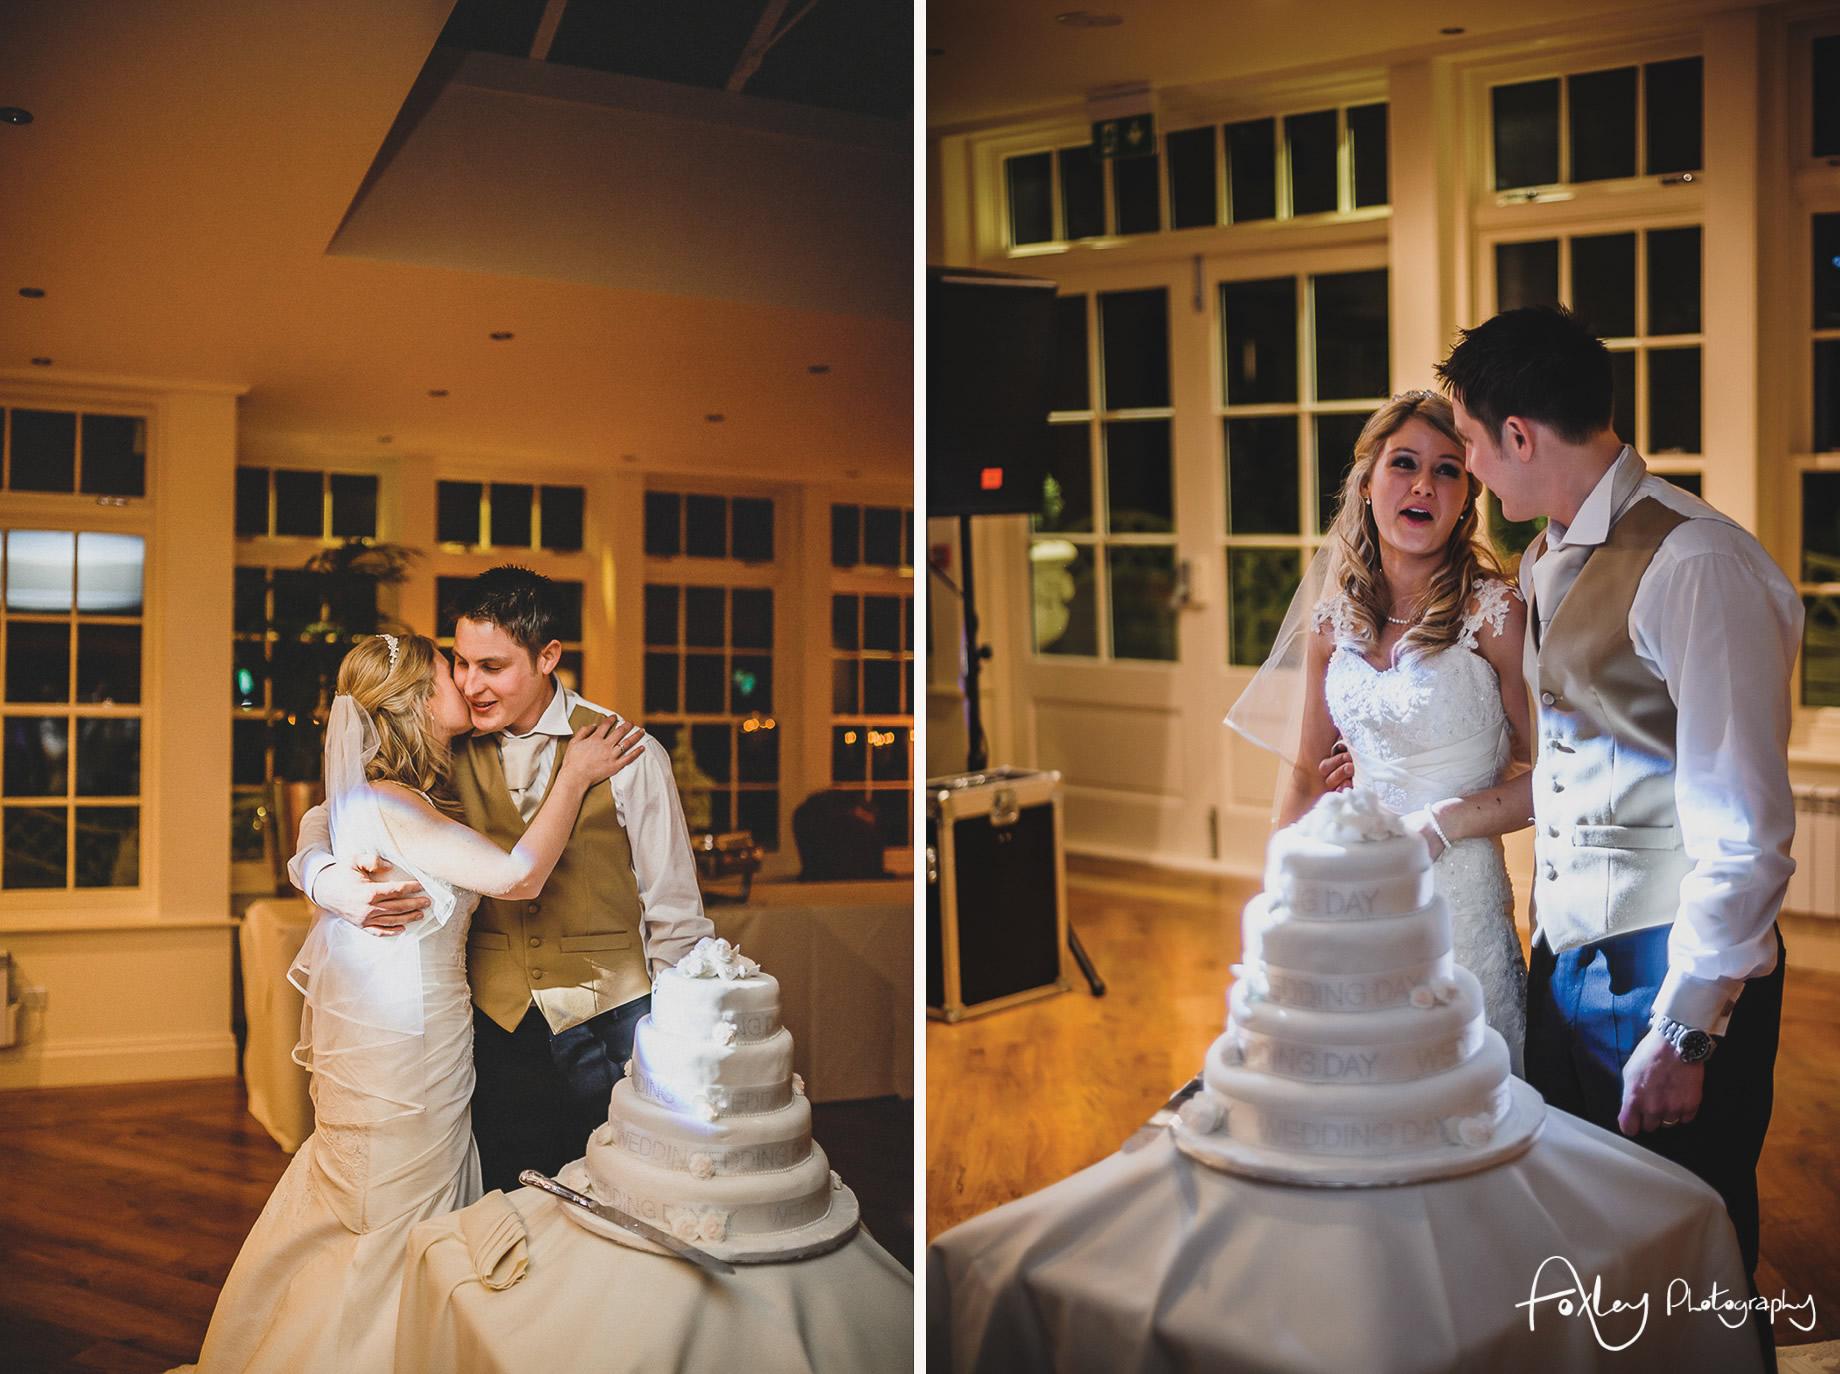 Gemma and Lewis' Wedding at Mitton Hall 150